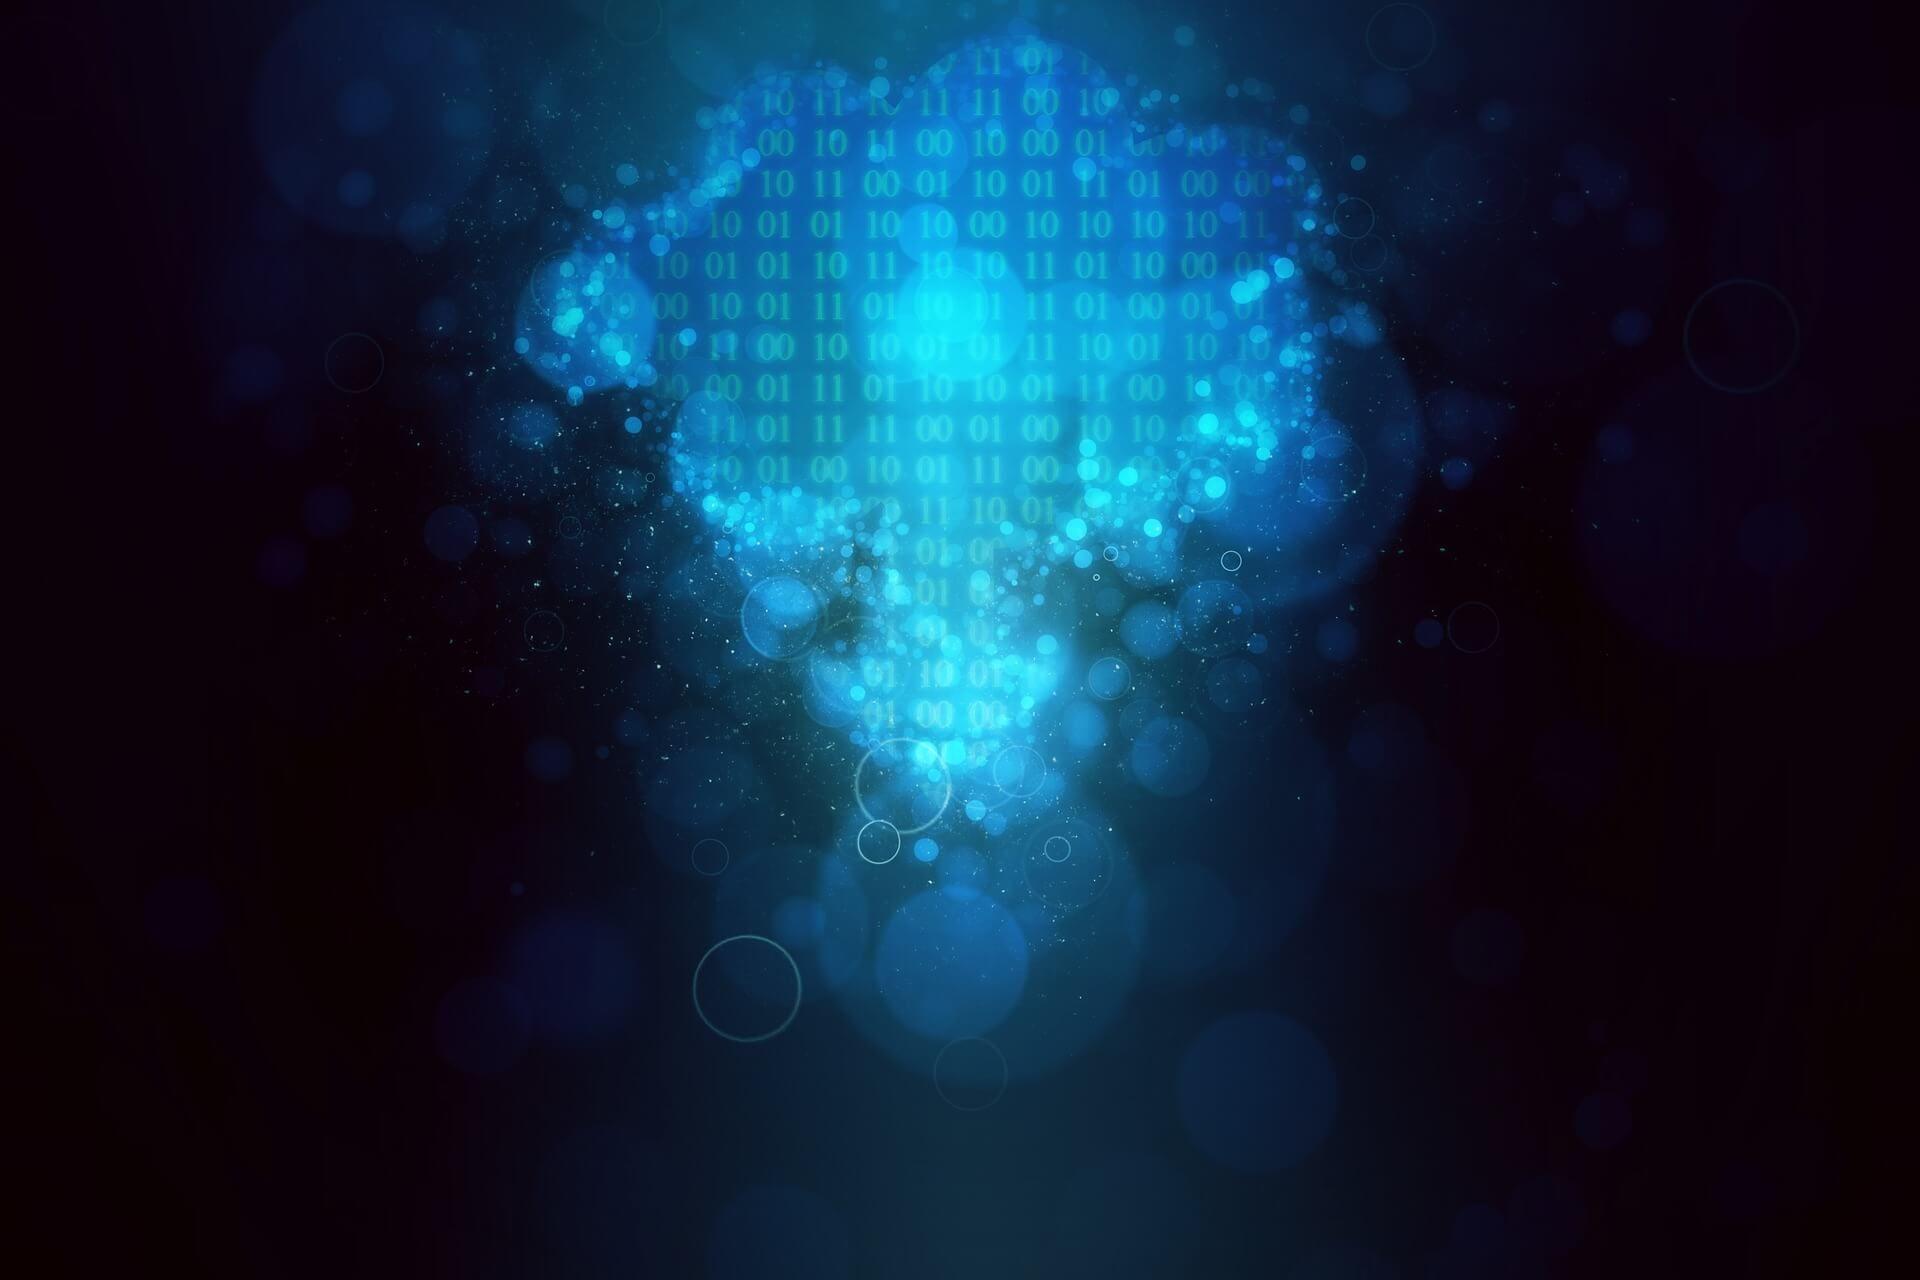 /b2b-fintech-trends-for-2021-storage-security-cloud-migration-iaac-vw1m3wvm feature image